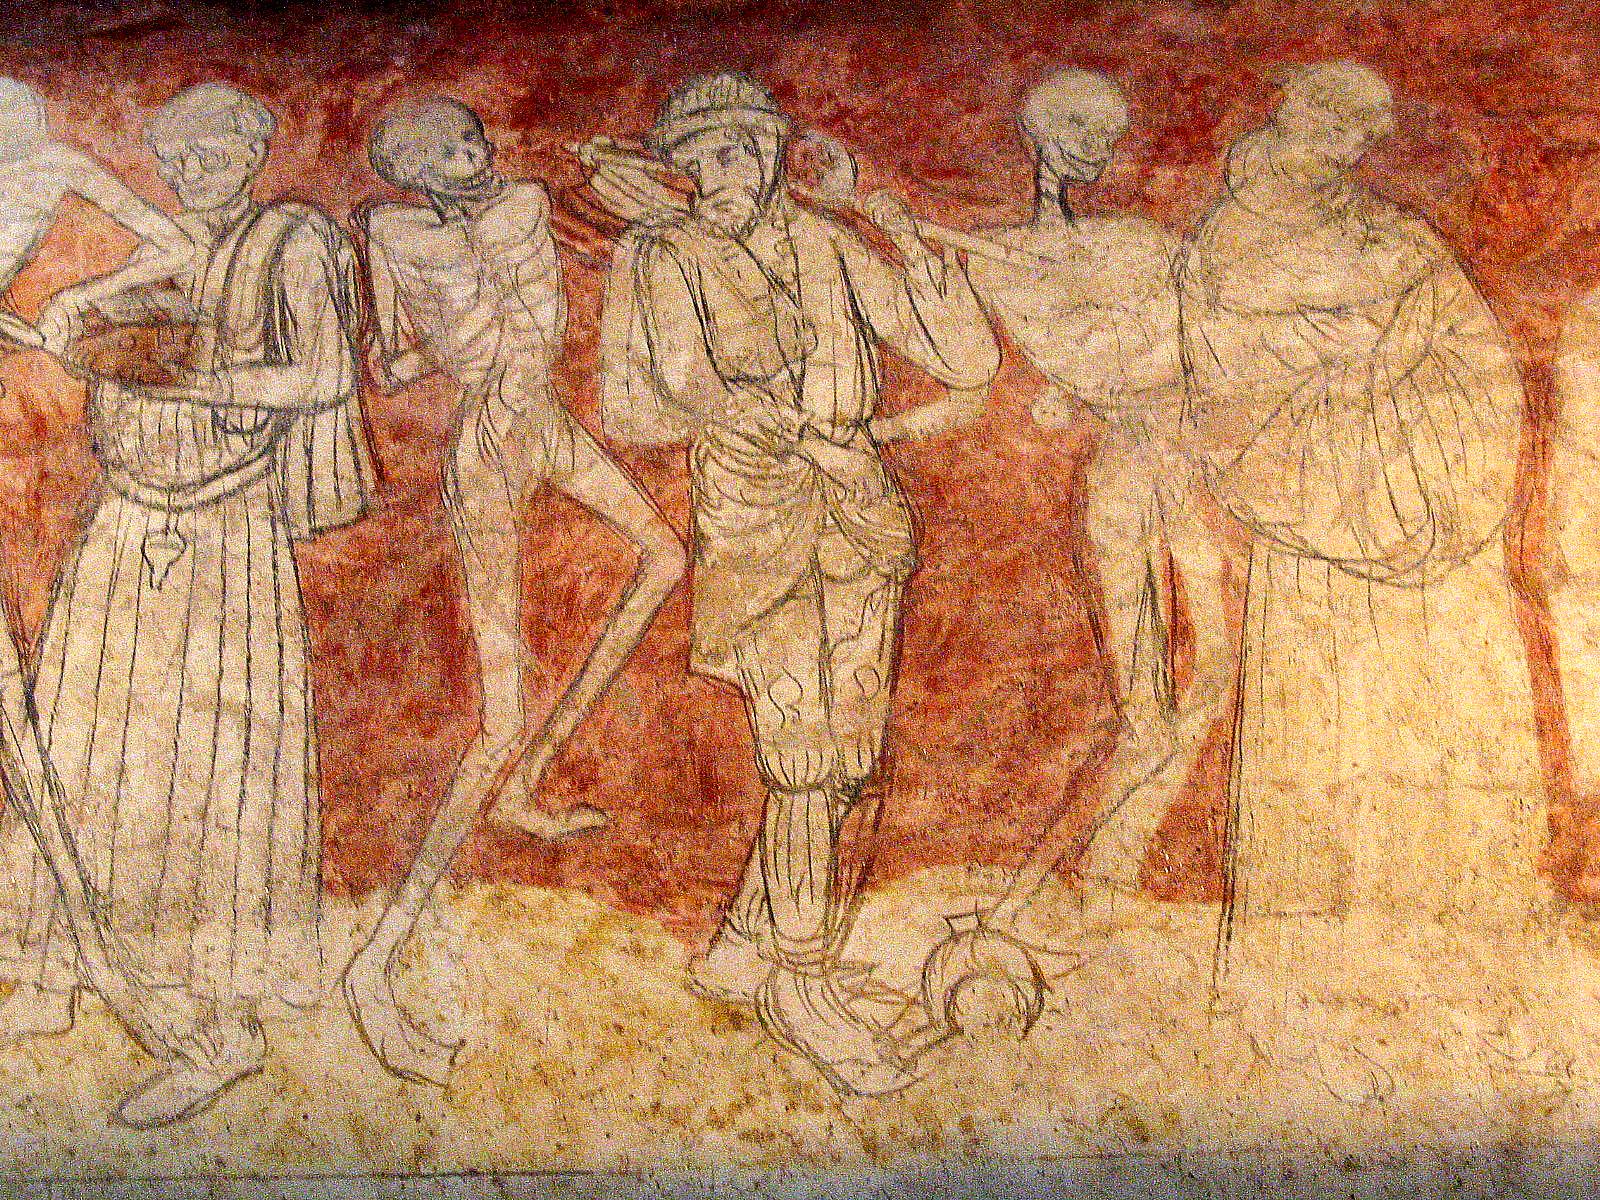 Picture credit: Jean-Pol GRANDMONT http://commons.wikimedia.org/wiki/File:01_La_Chaise-Dieu_-_La_danse_macabre_1.JPG